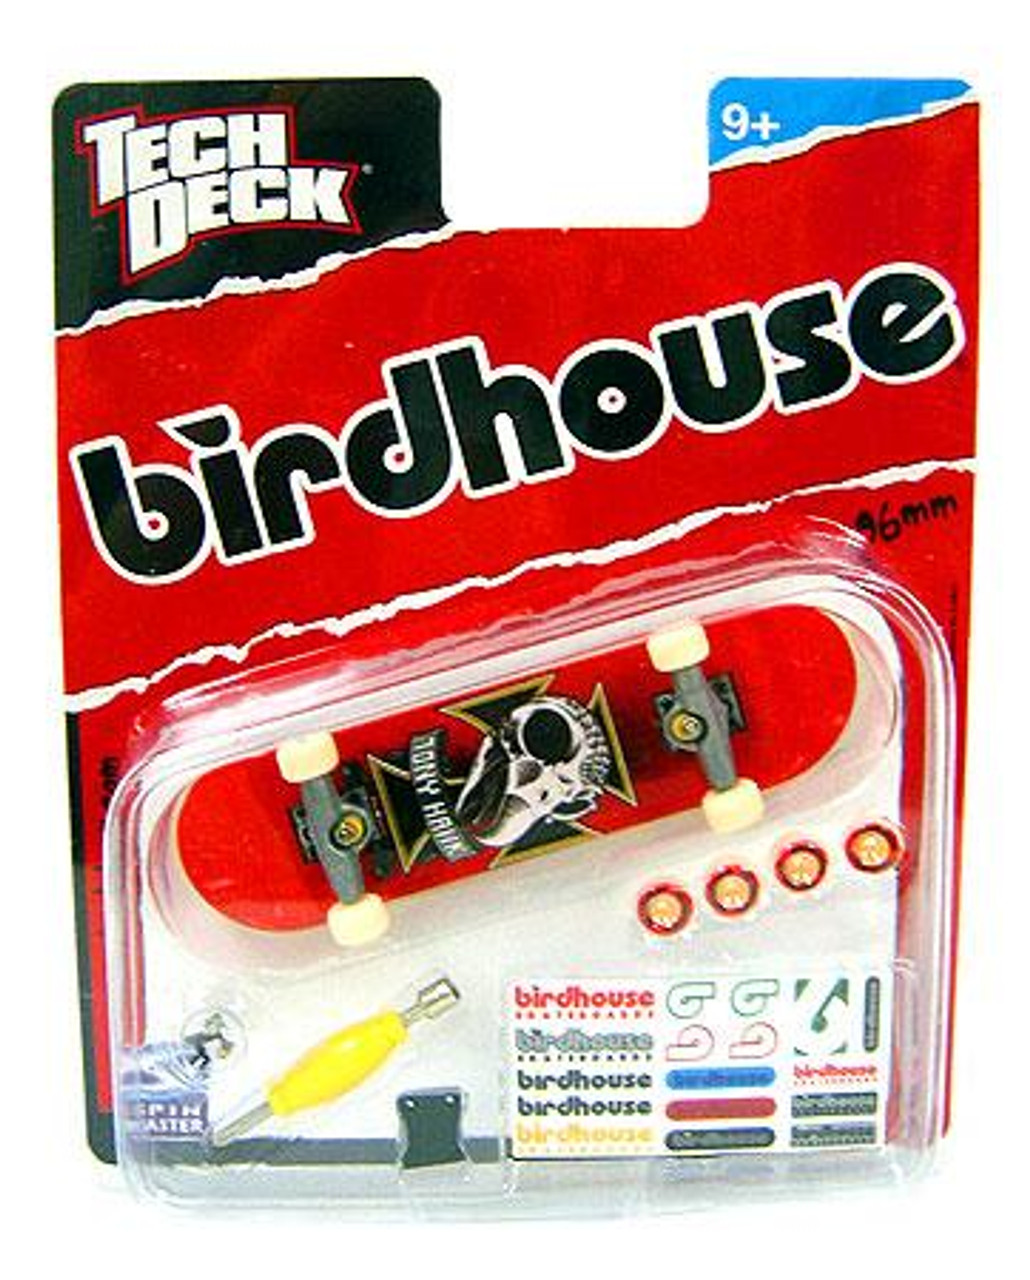 Tech Deck Birdhouse 96mm Mini Skateboard [Tony Hawk]